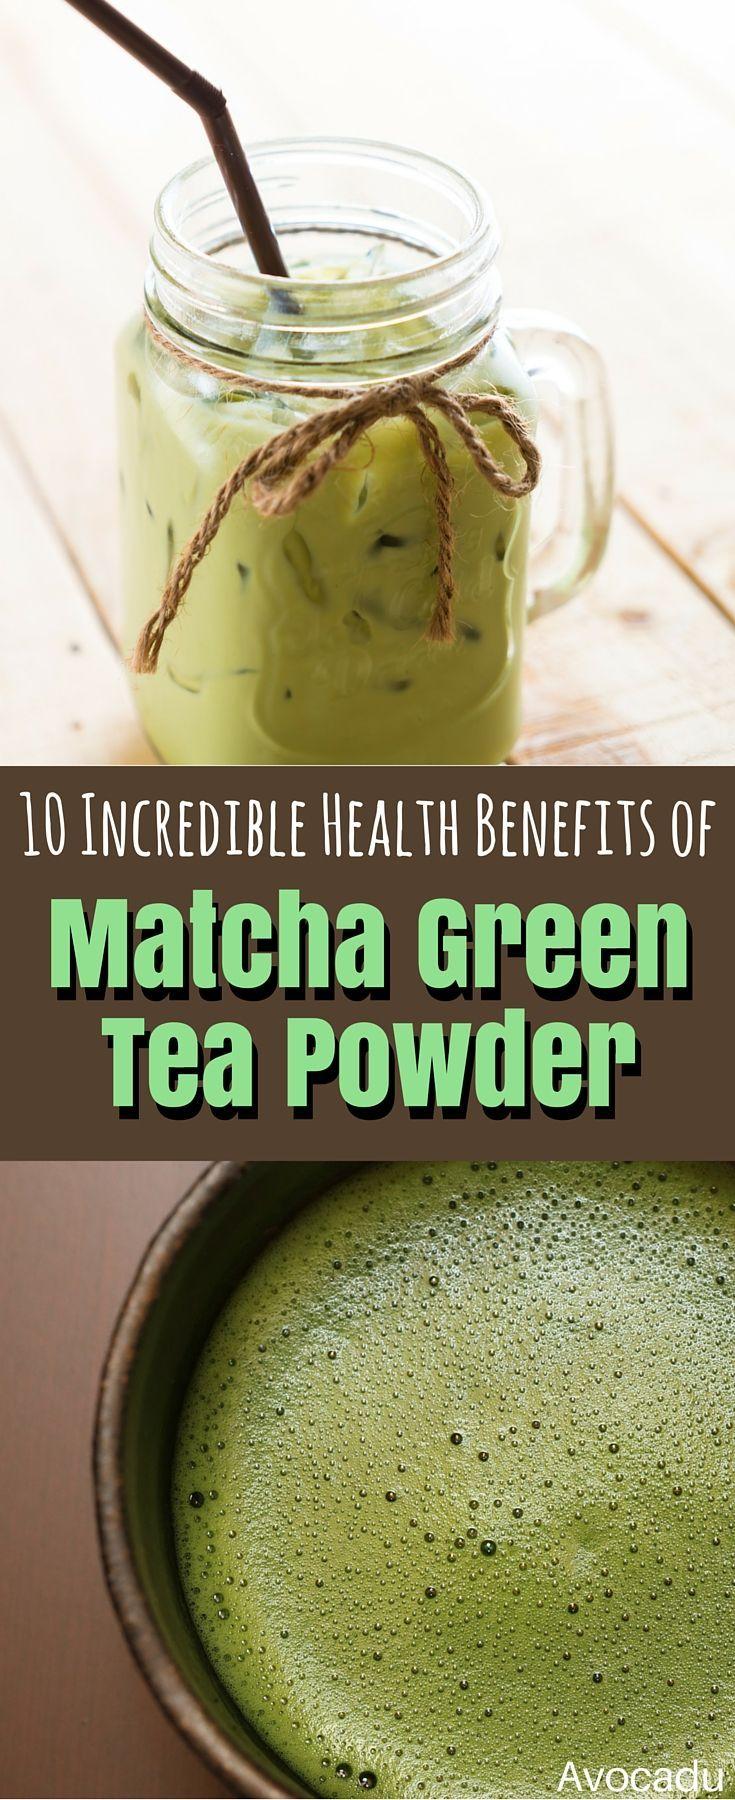 10 Incredible Health Benefits of Matcha Green Tea Powder